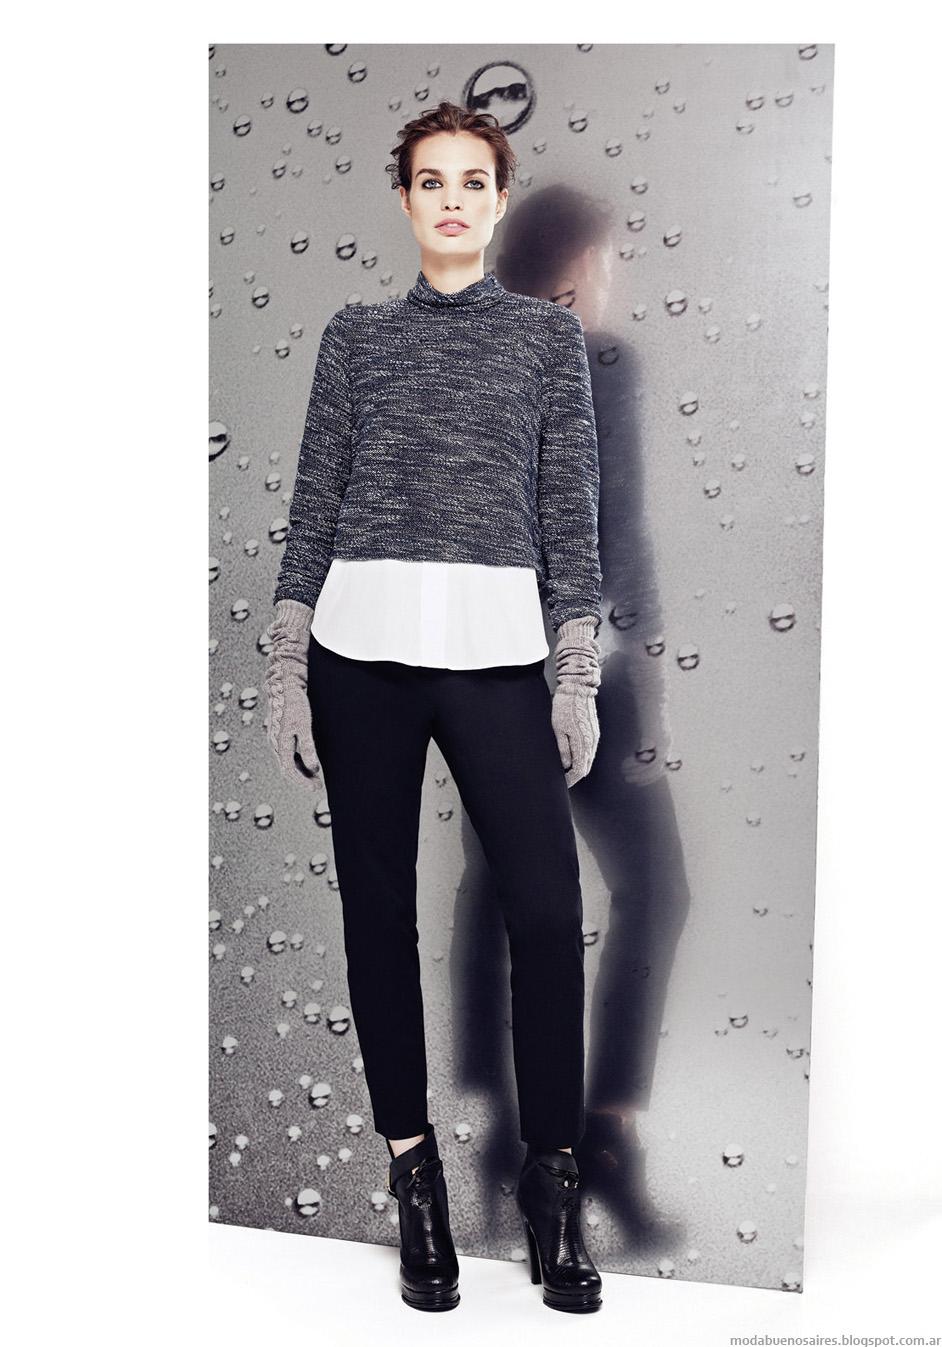 Moda otoño invierno 2014 Graciela Naum moda mujer invierno 2014.